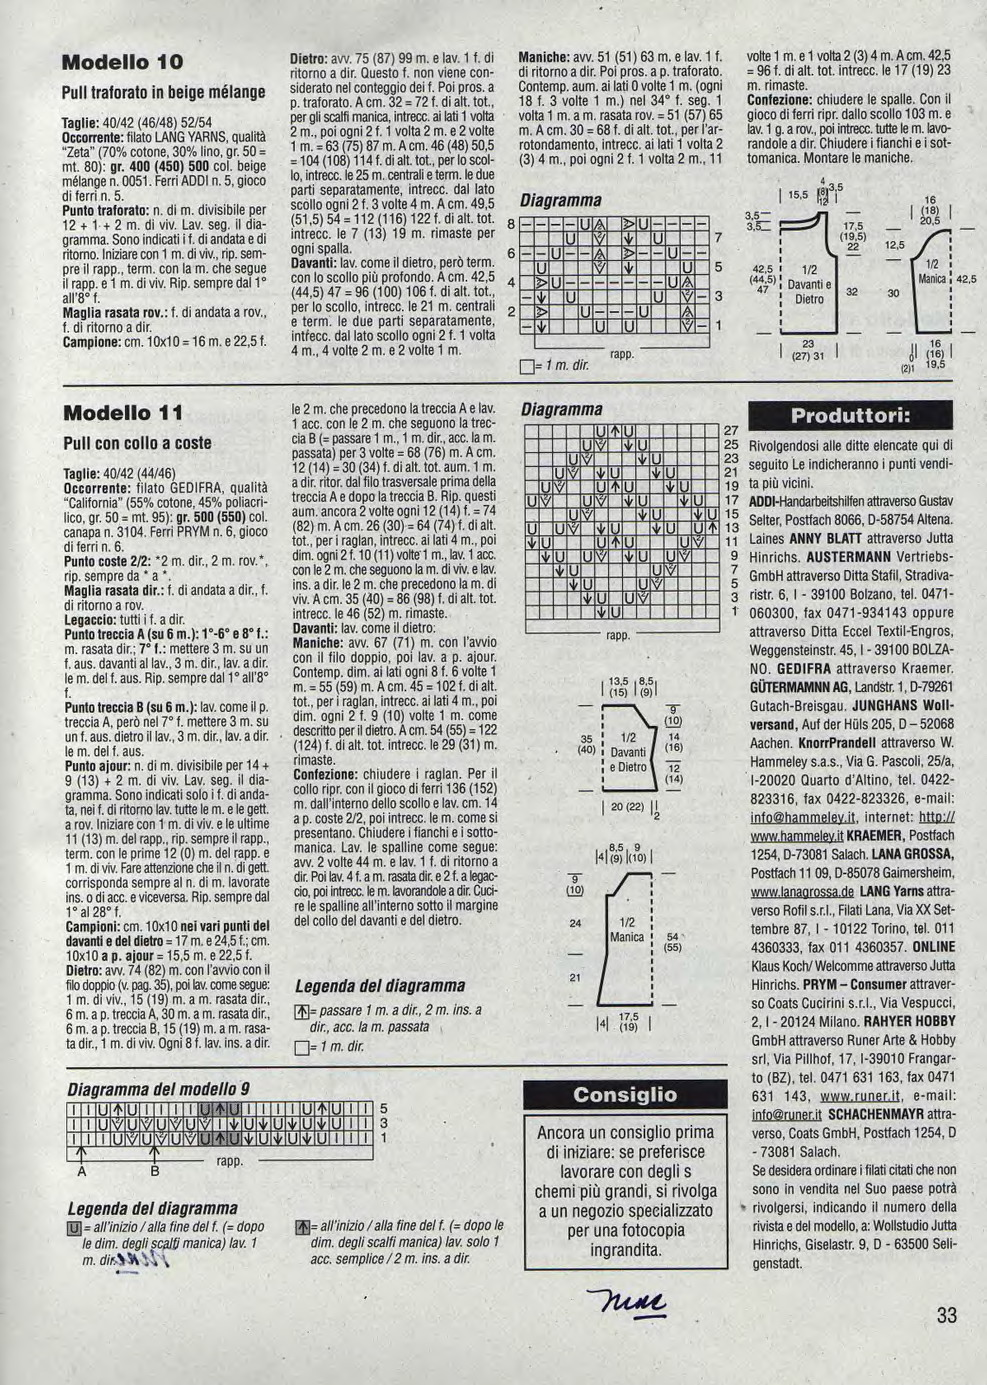 59e772de12b7f9f32c.jpg